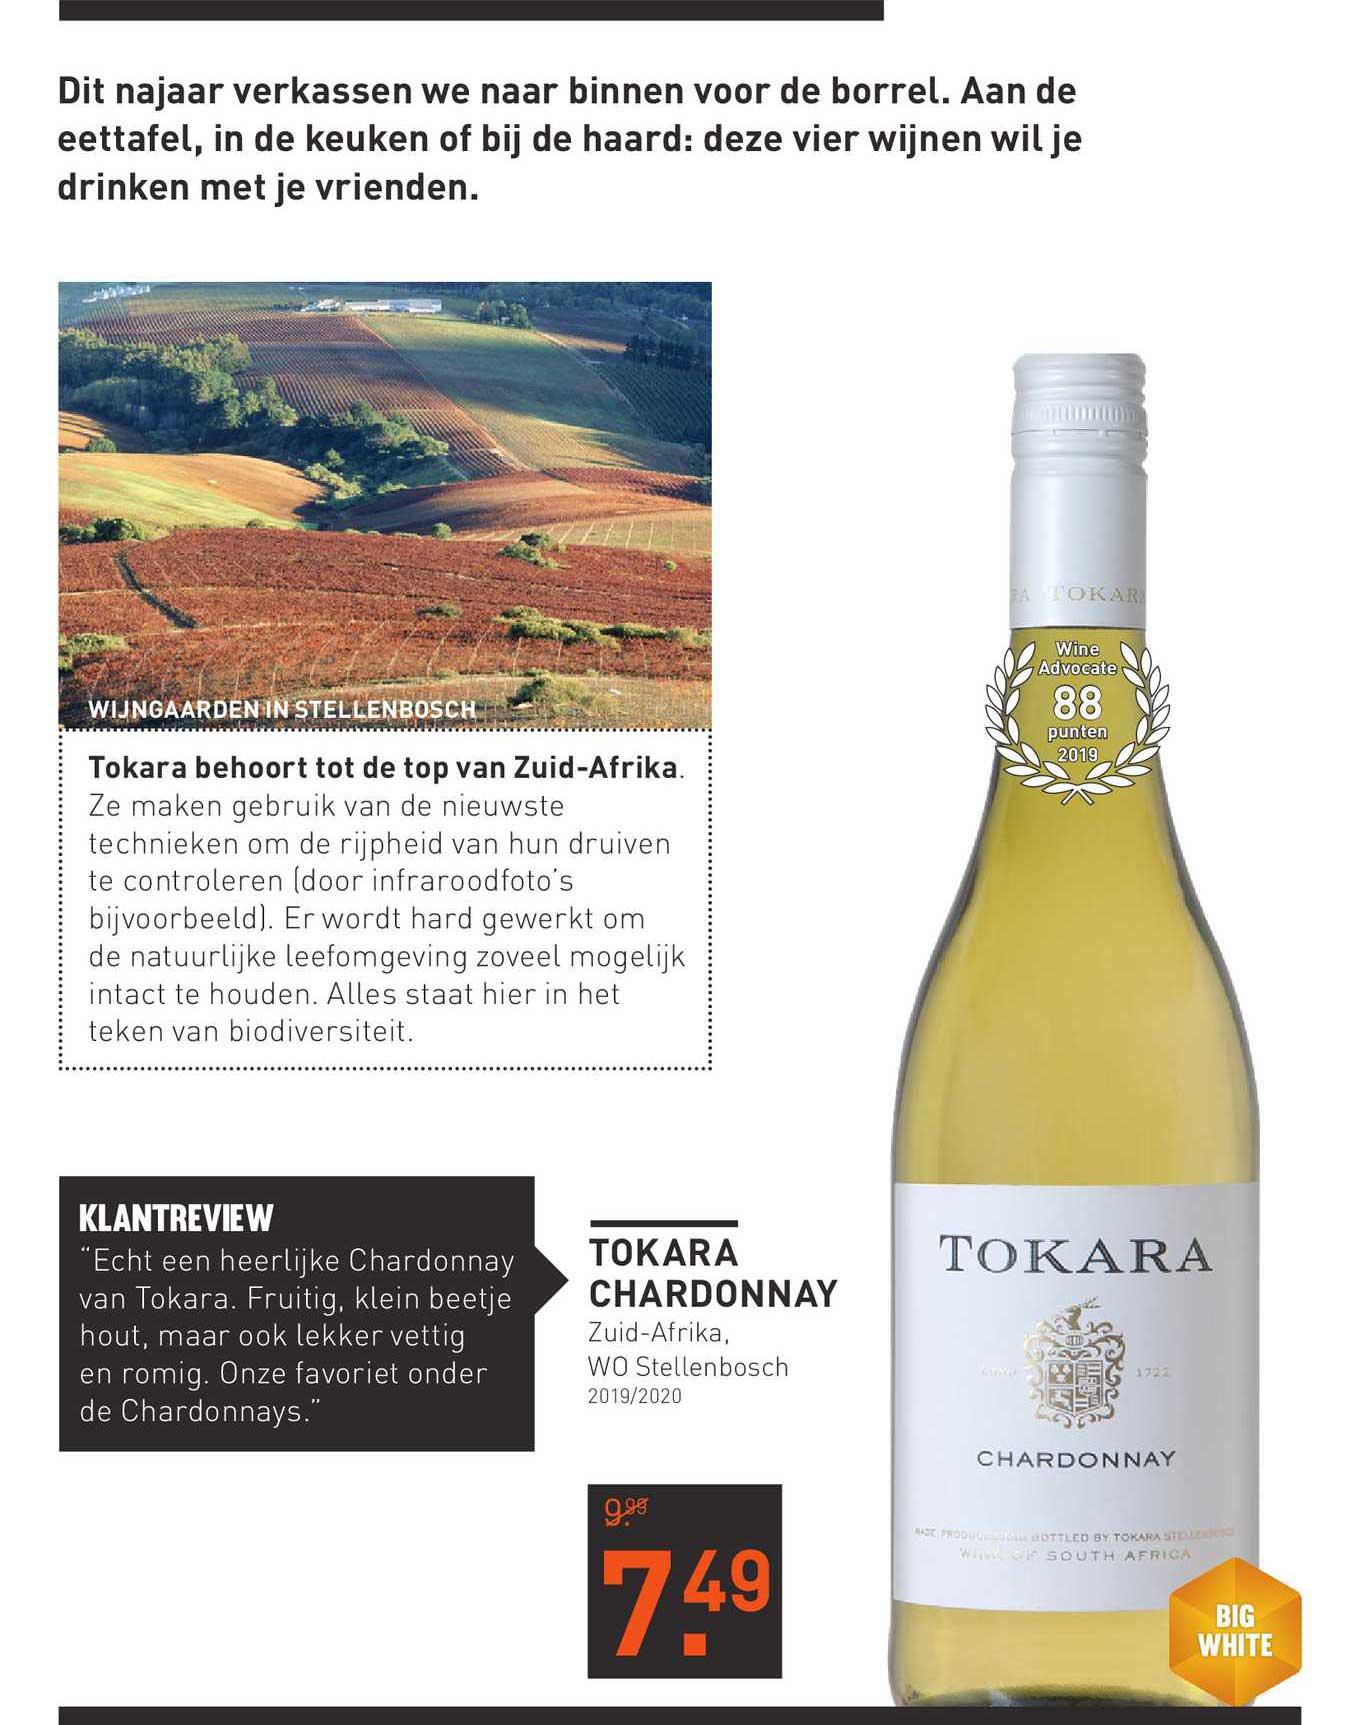 Gall & Gall Tokara Chardonnay